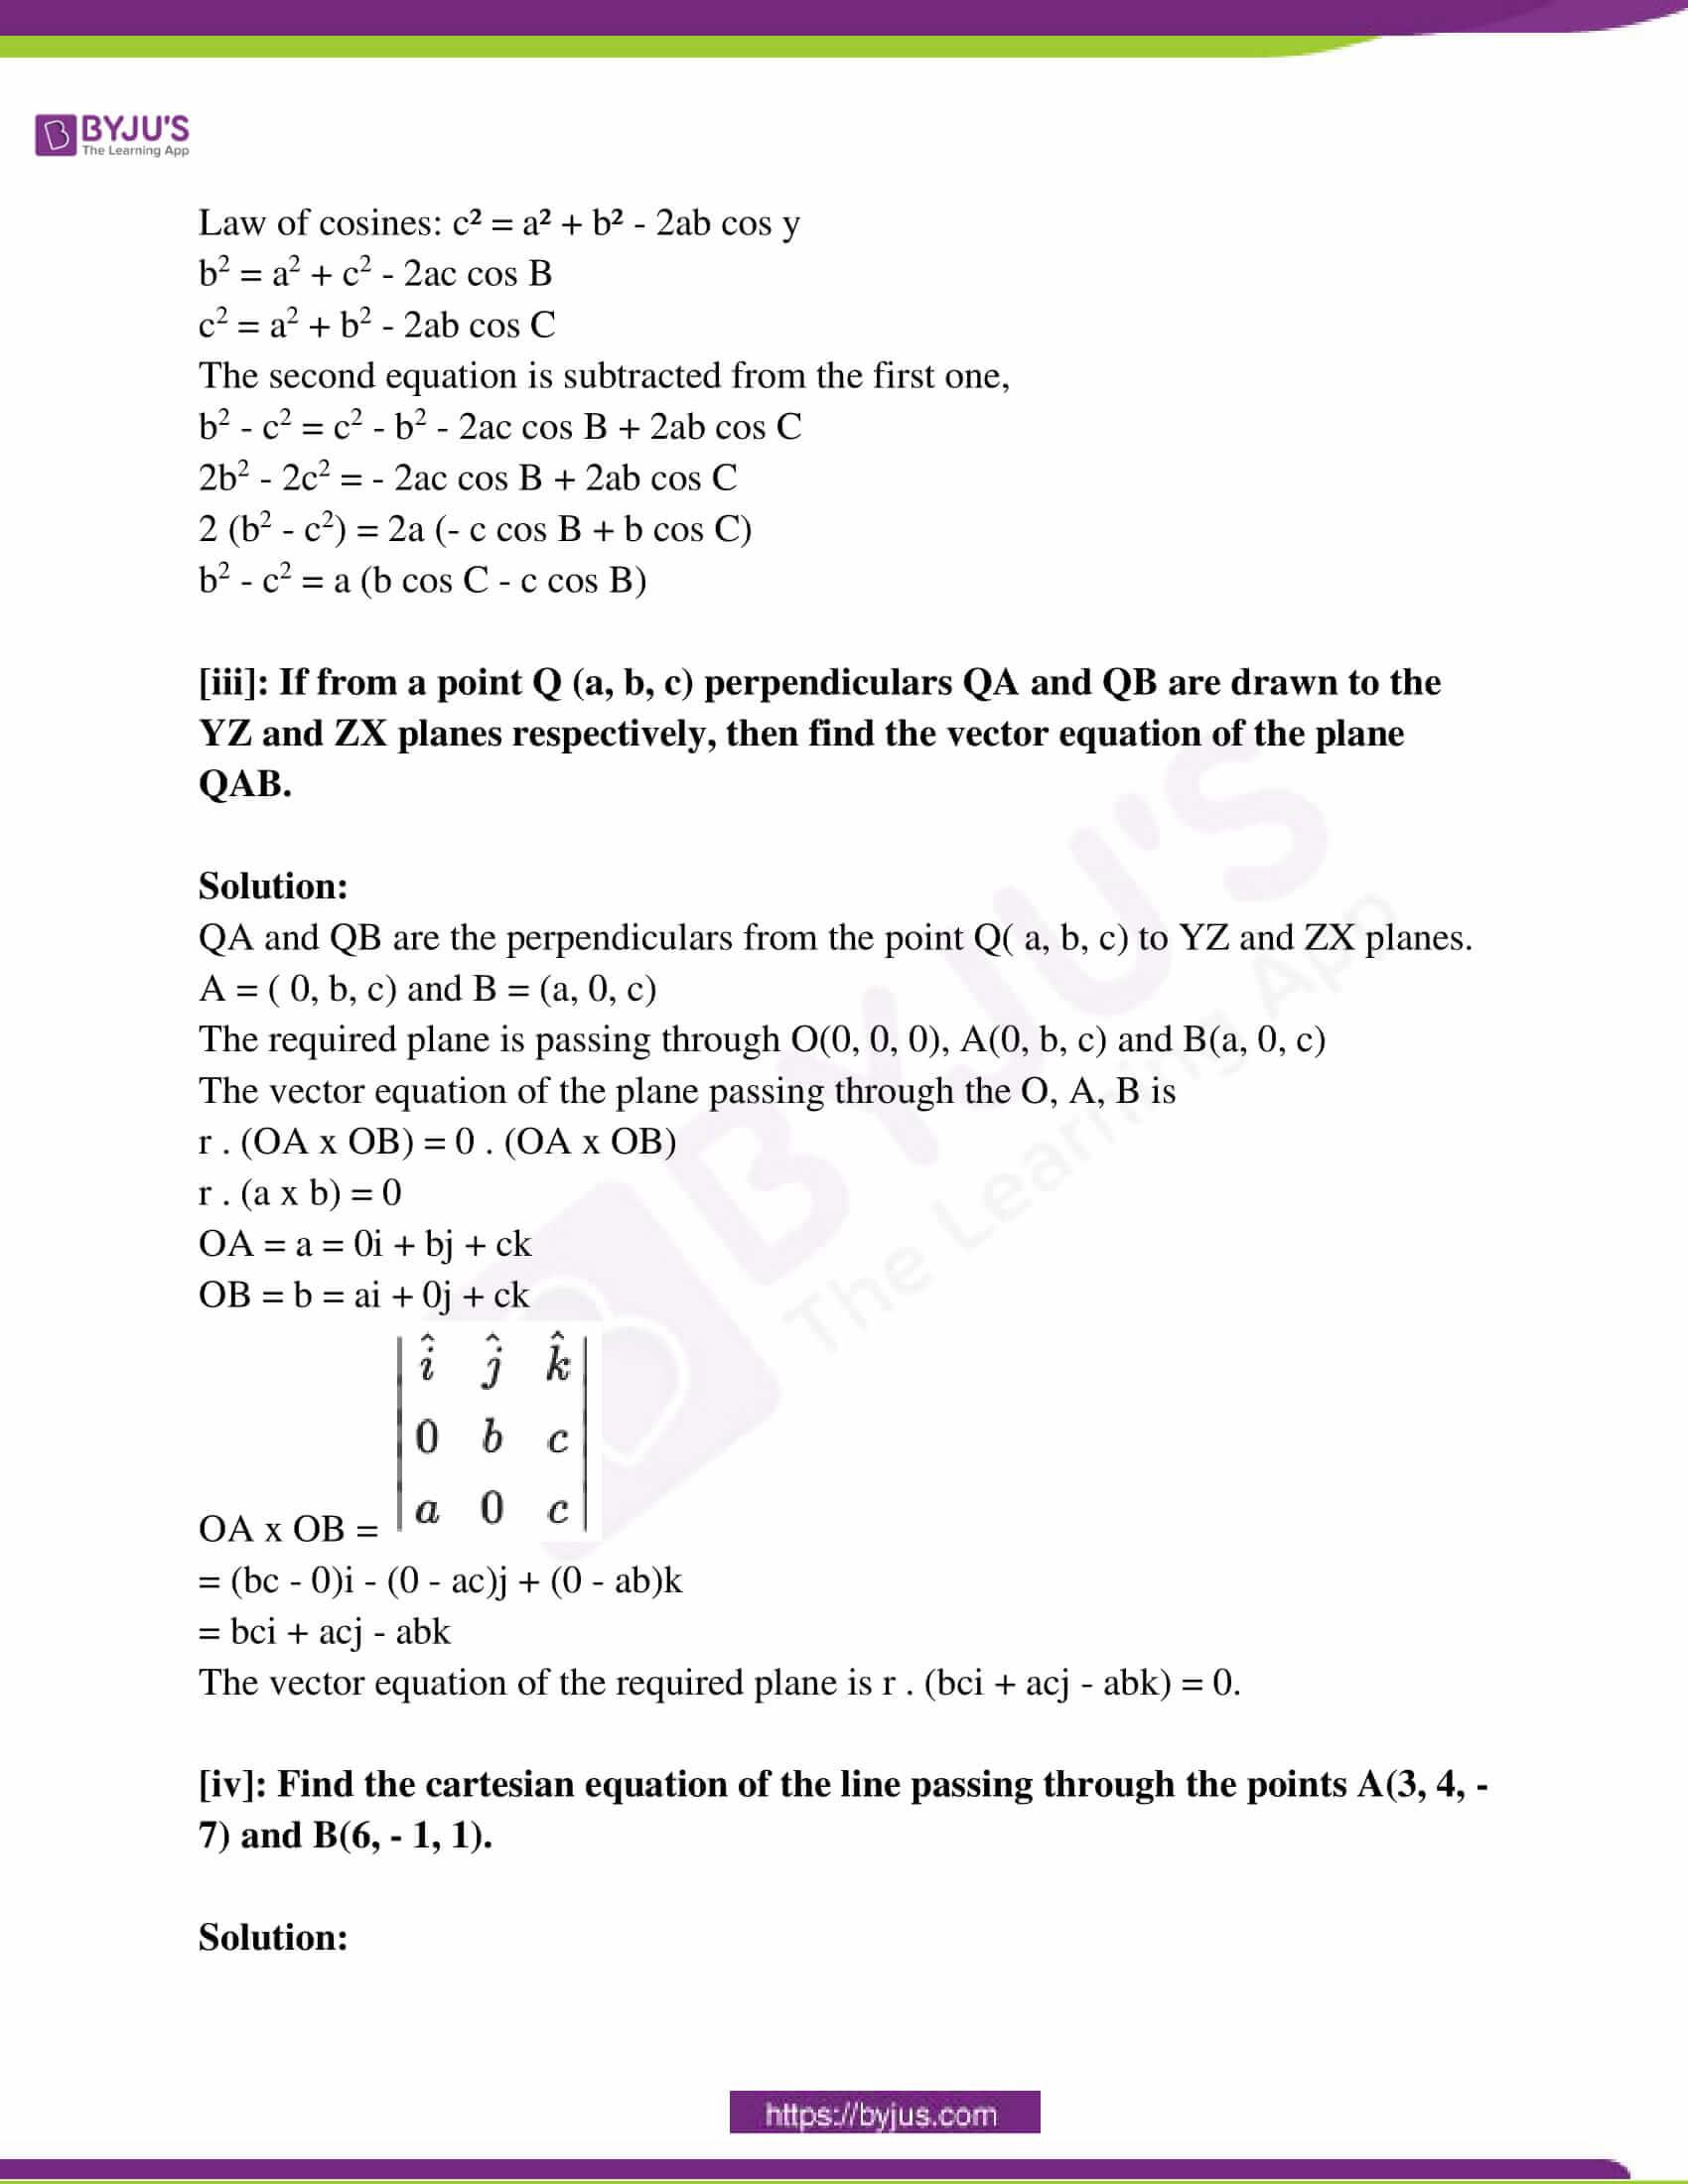 maharashtra class 12 exam question paper solutions march 2017 05